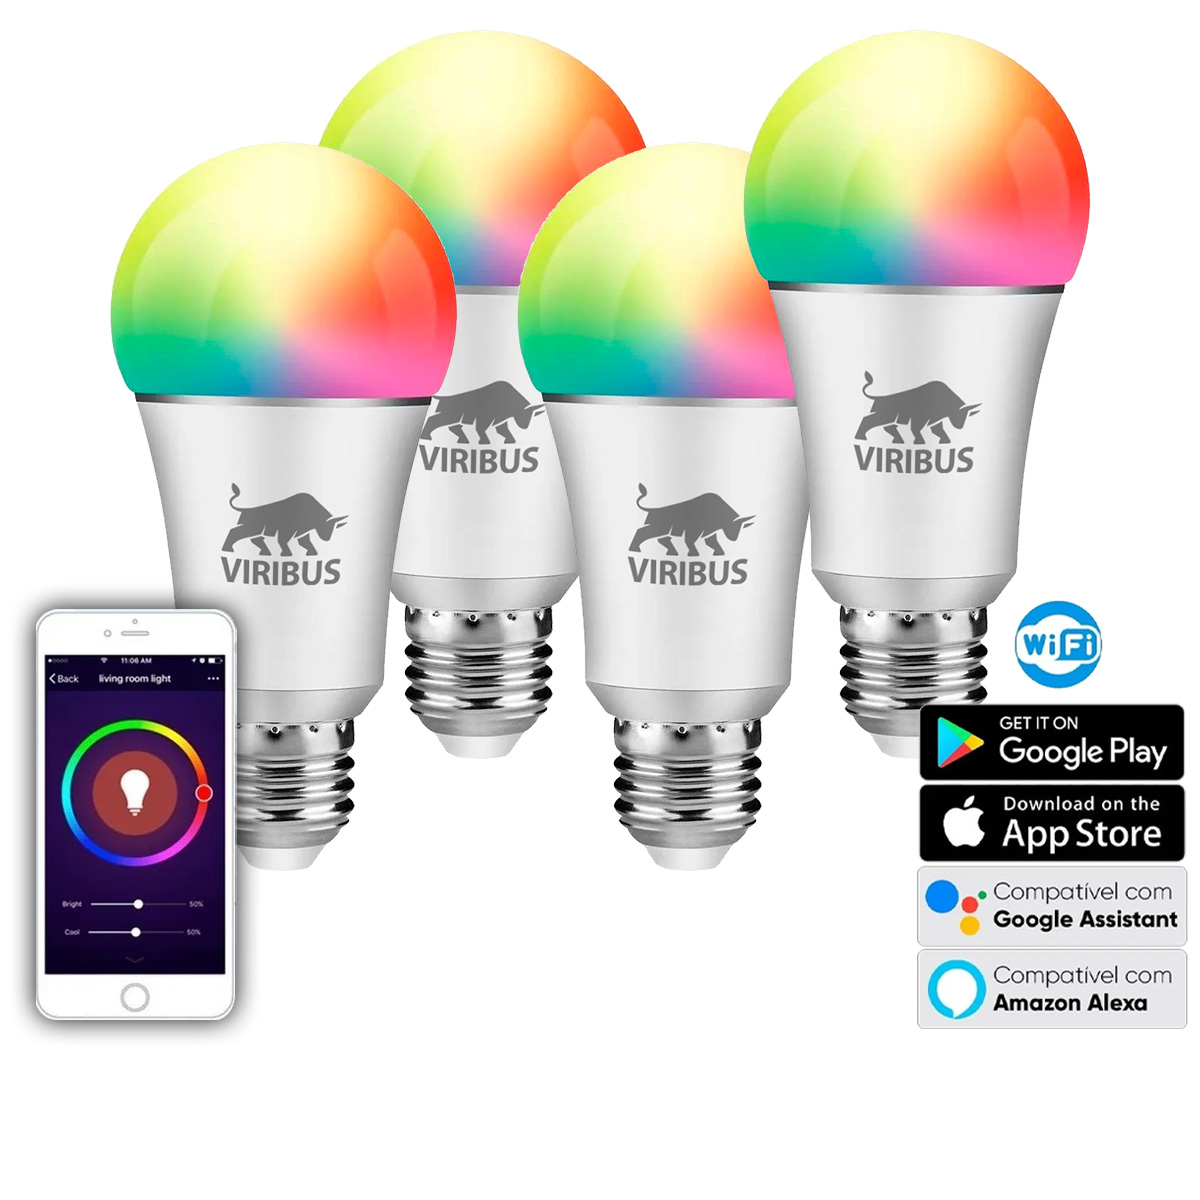 Kit 5und Lampada Led Inteligente Rgb 9w Android Ios Wi-fi